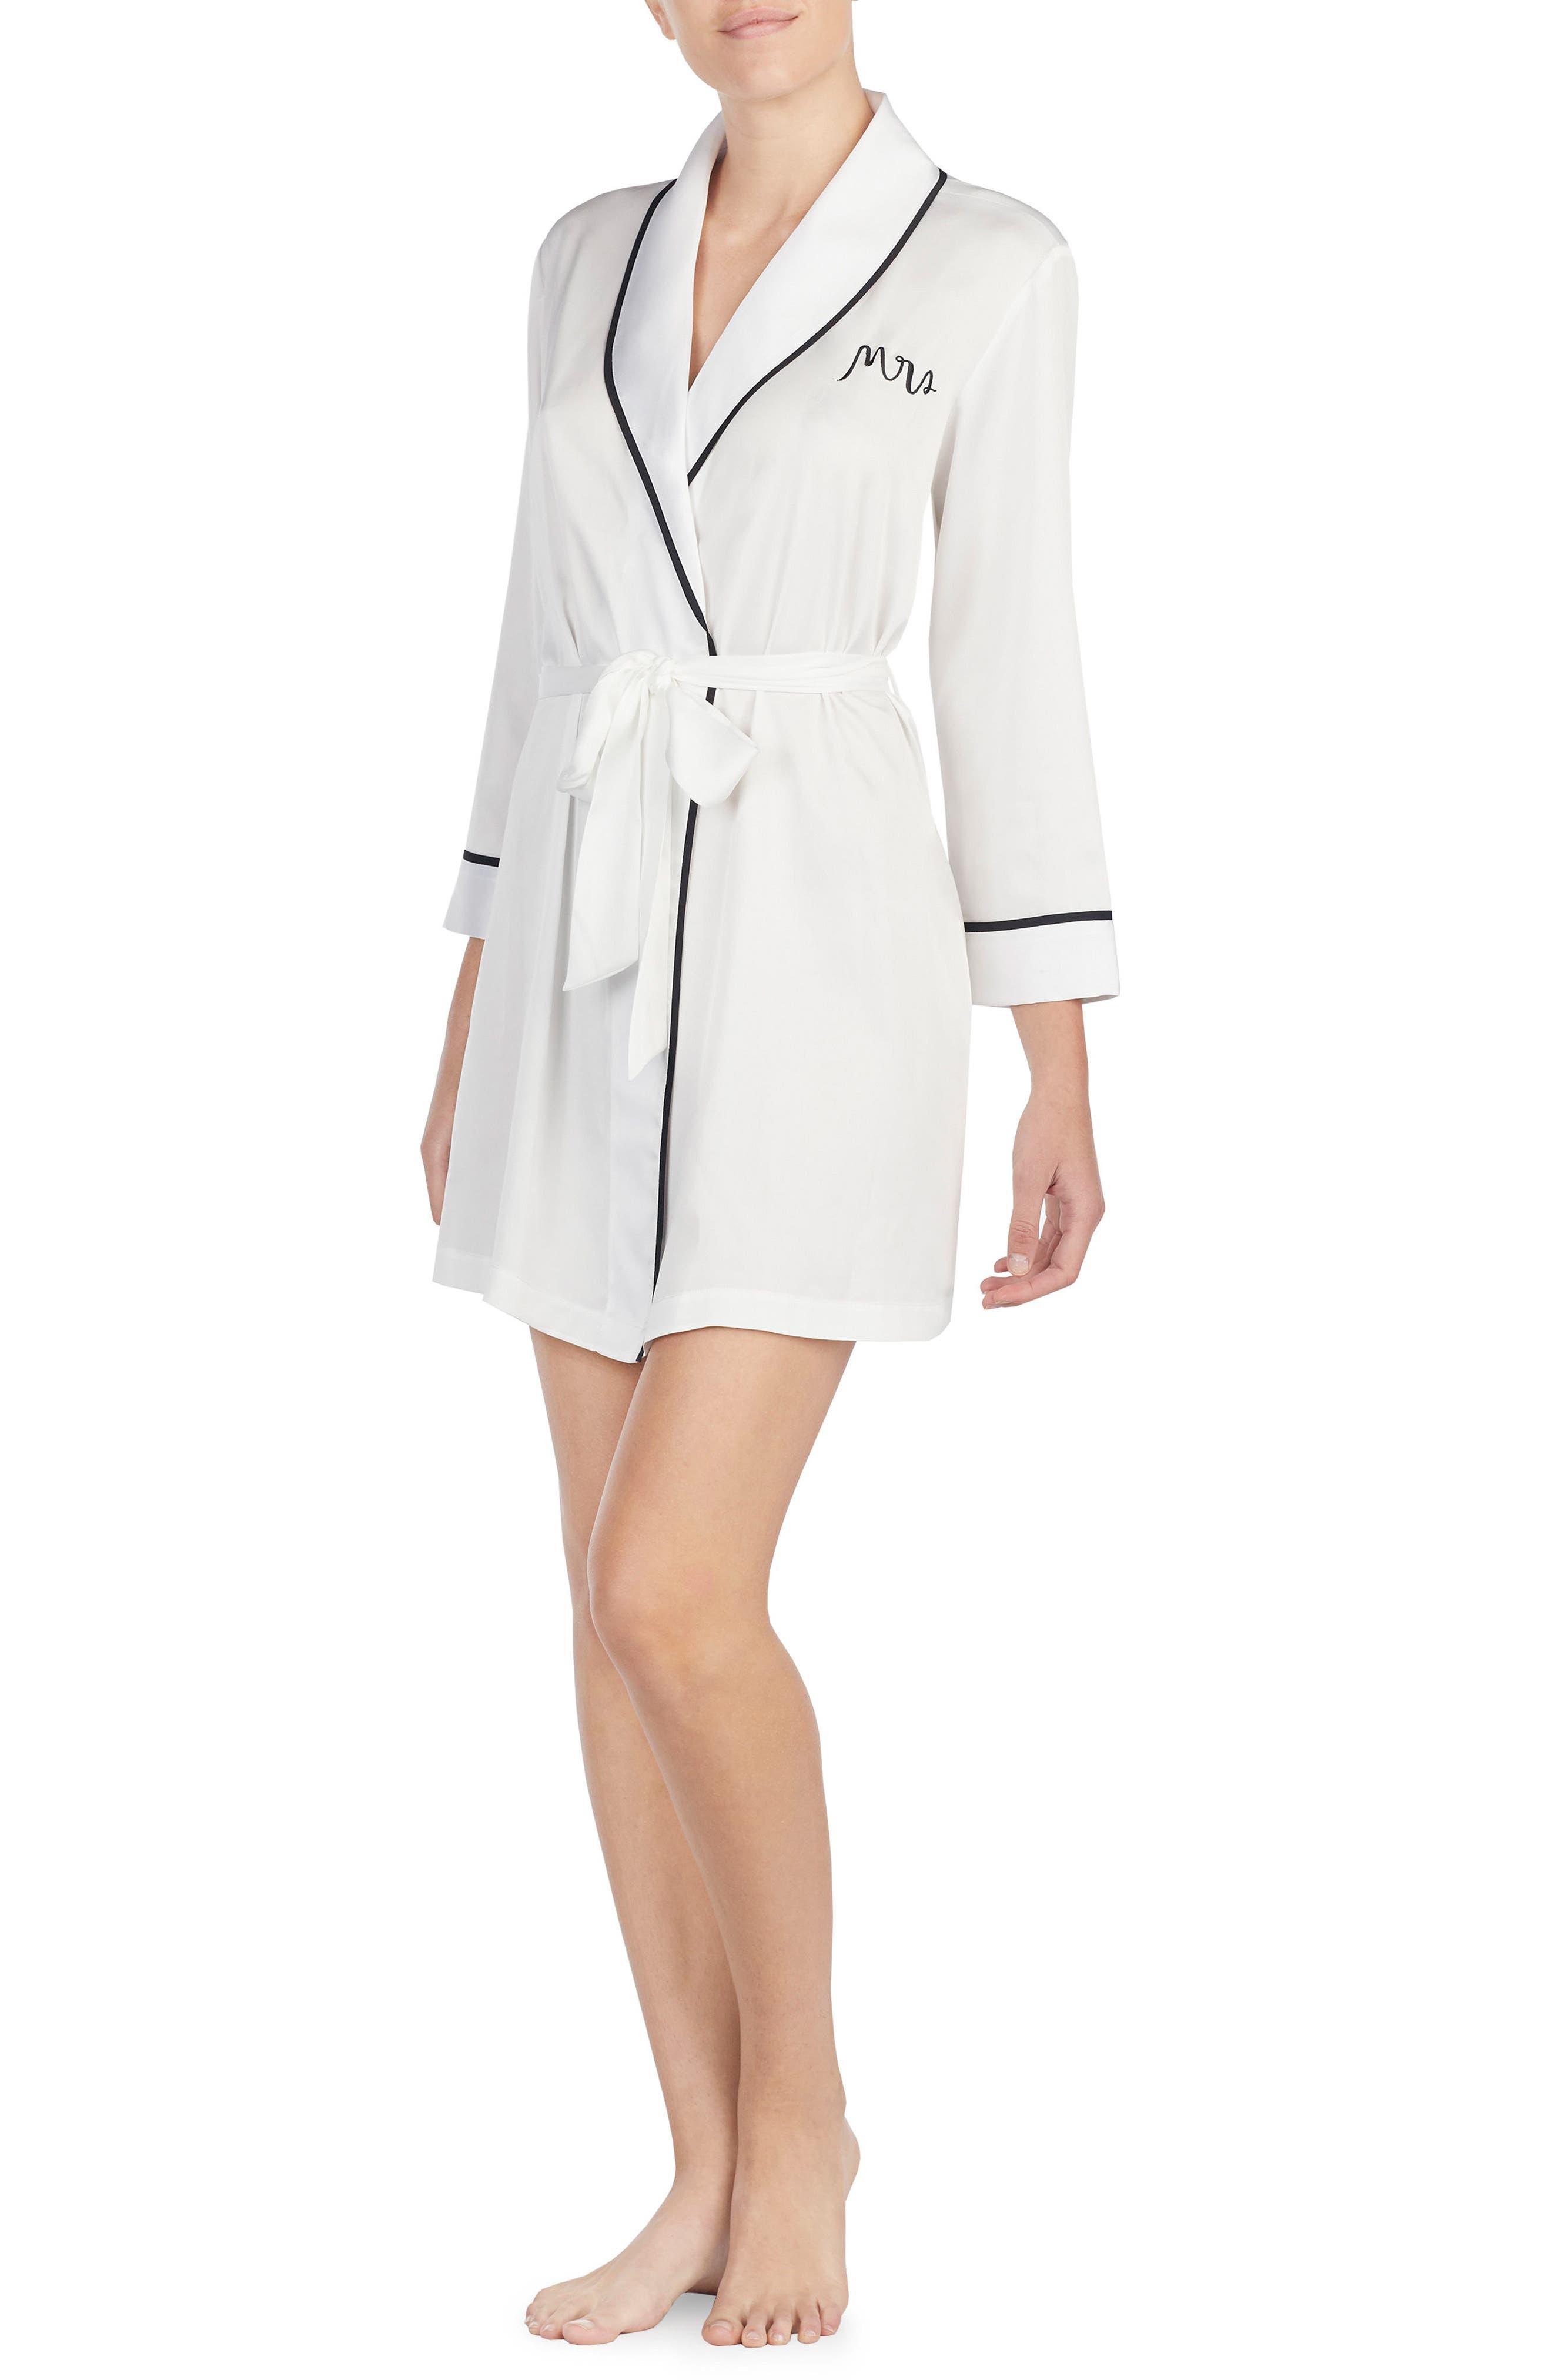 KATE SPADE NEW YORK mrs charmeuse short robe, Main, color, OFF WHITE